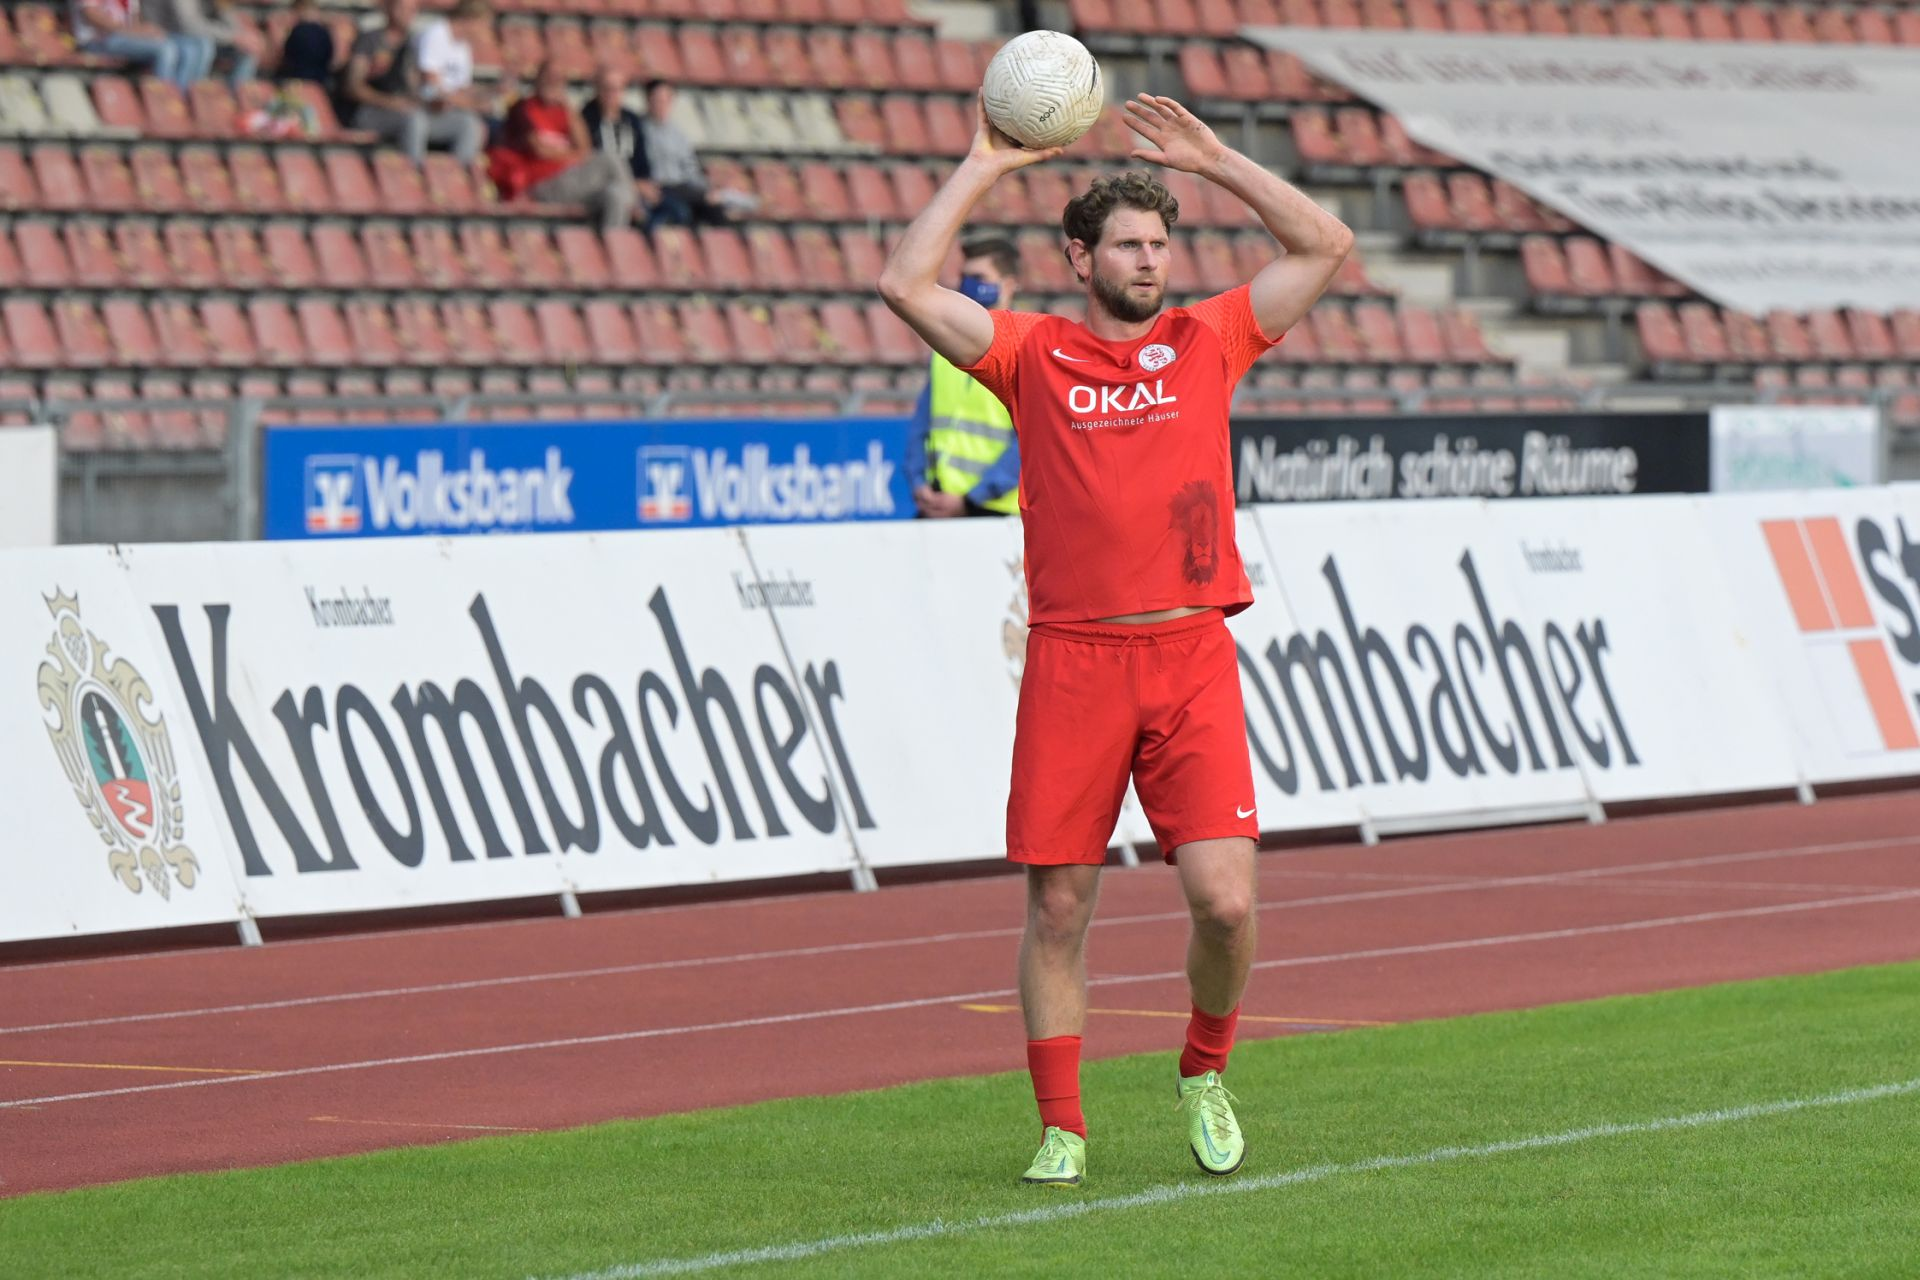 KSV Hessen Kassel, VfB Stuttgart II, Regionalliga S�dwest, Saison 2021/22, Endstand 3:2